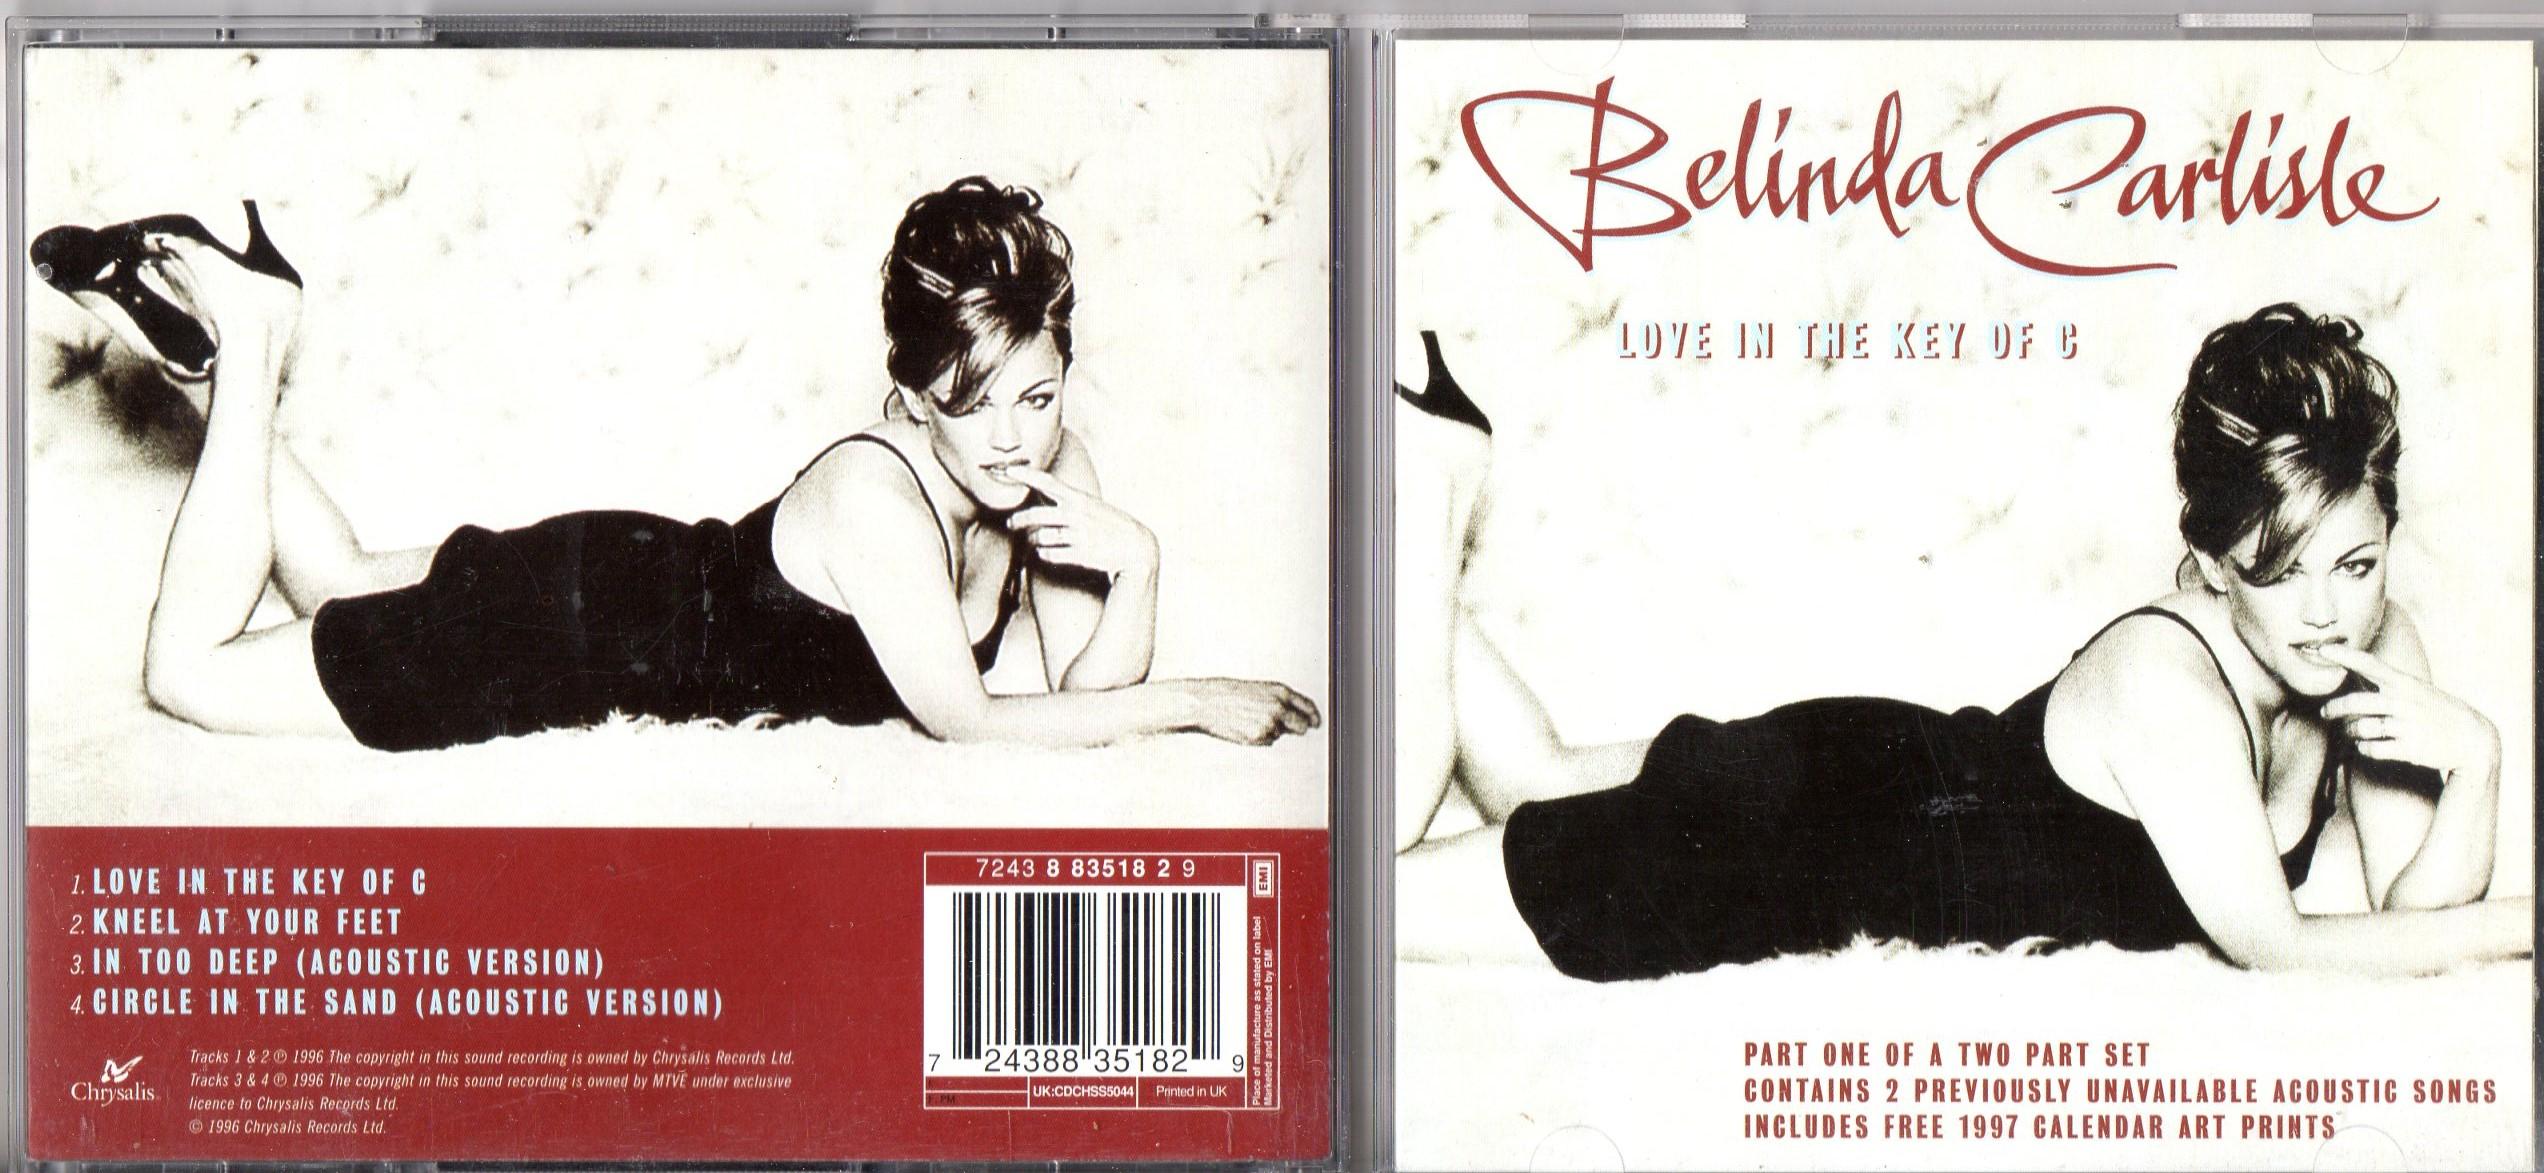 Belinda CARLISLE - Bigscaryanimal 3 Tracks Jewel Case